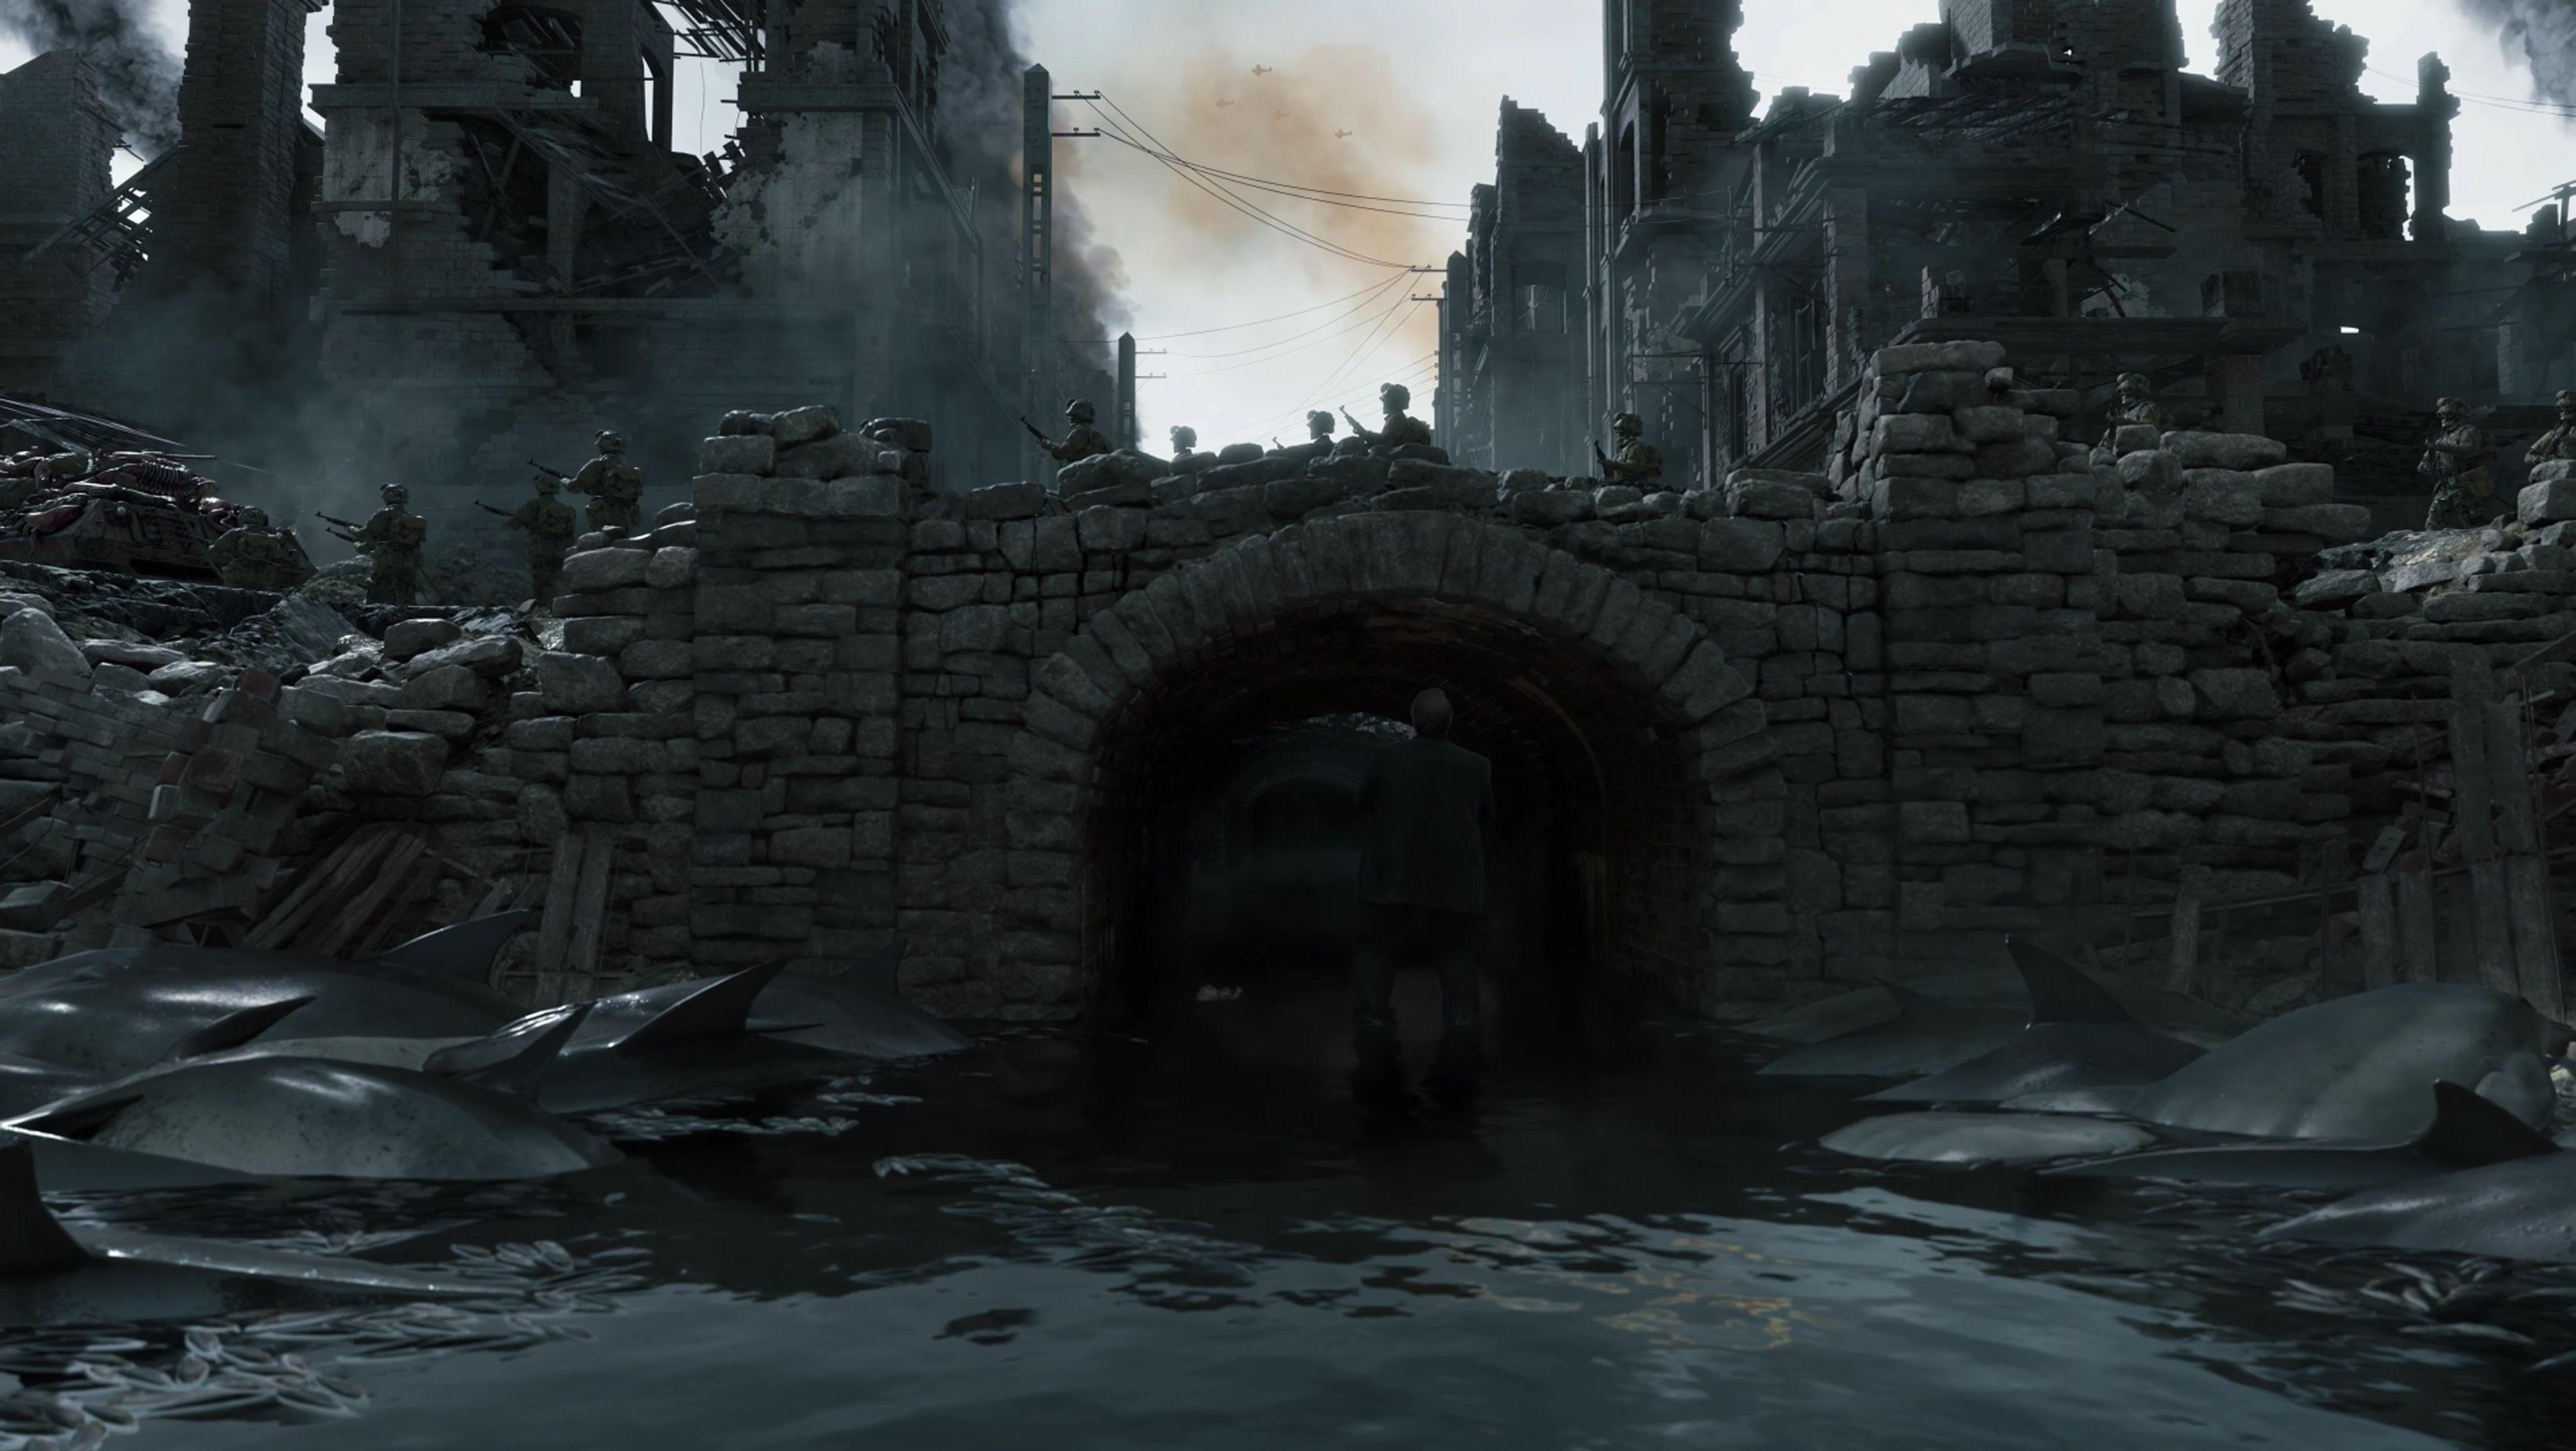 Death Stranding Wallpapers - Wallpaper Cave